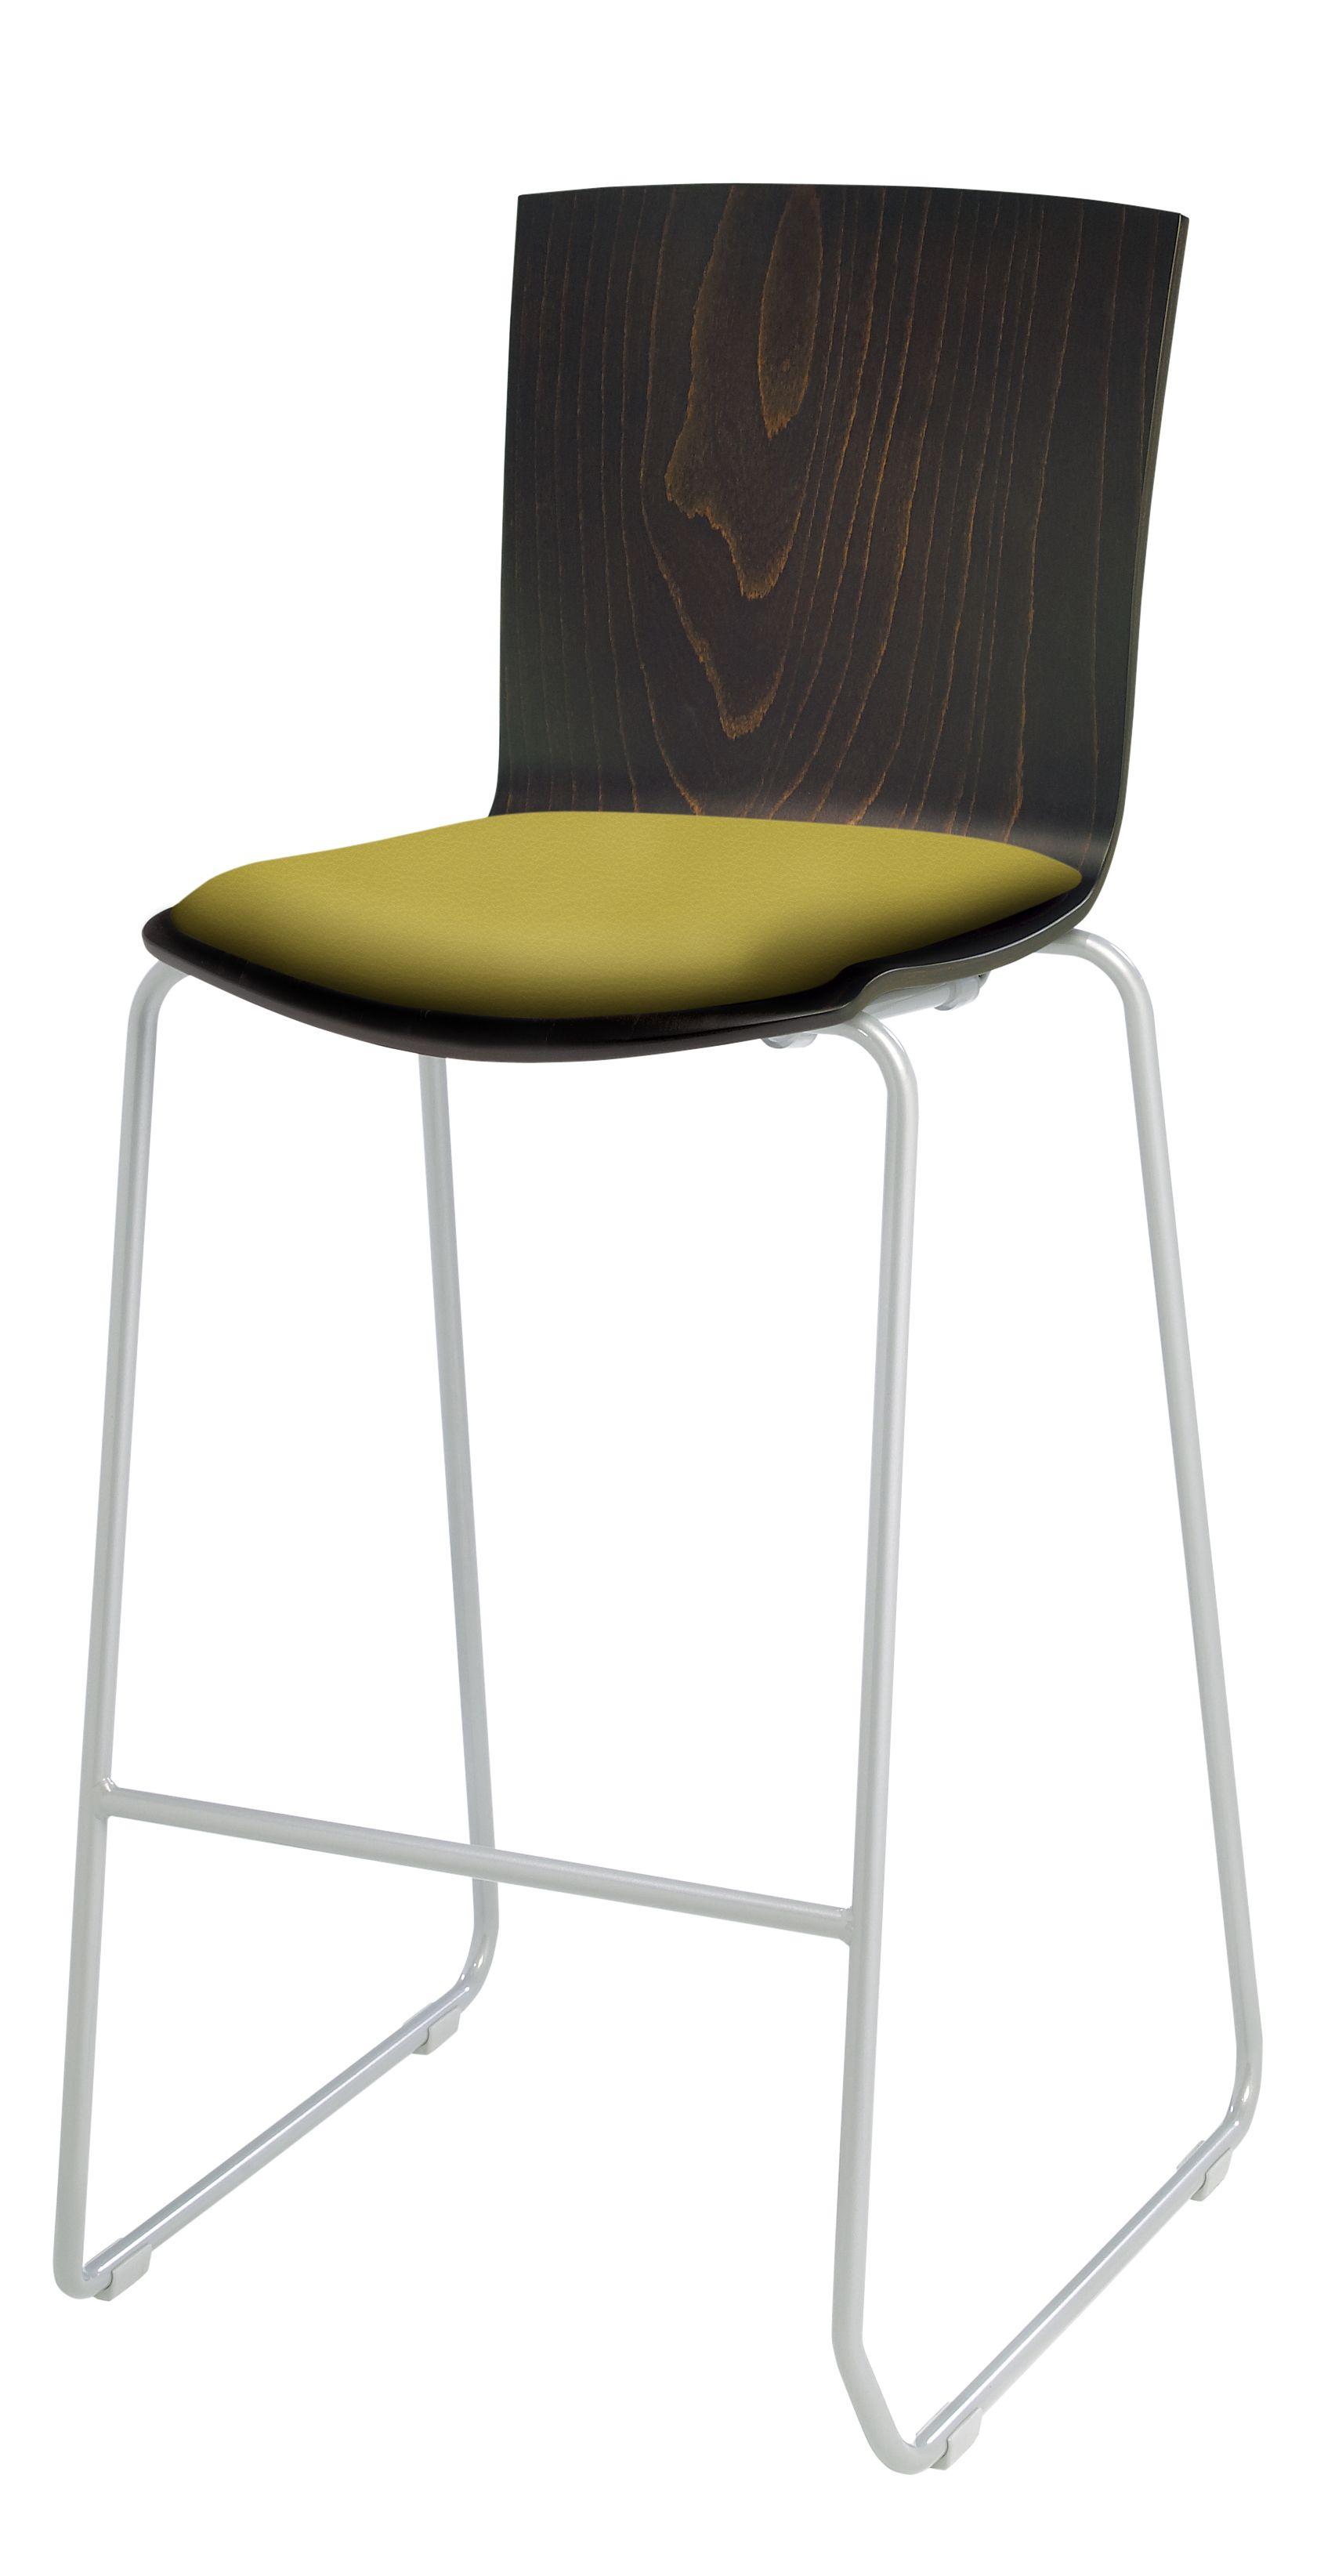 970bs leigh barstool resource furniture furniture bar